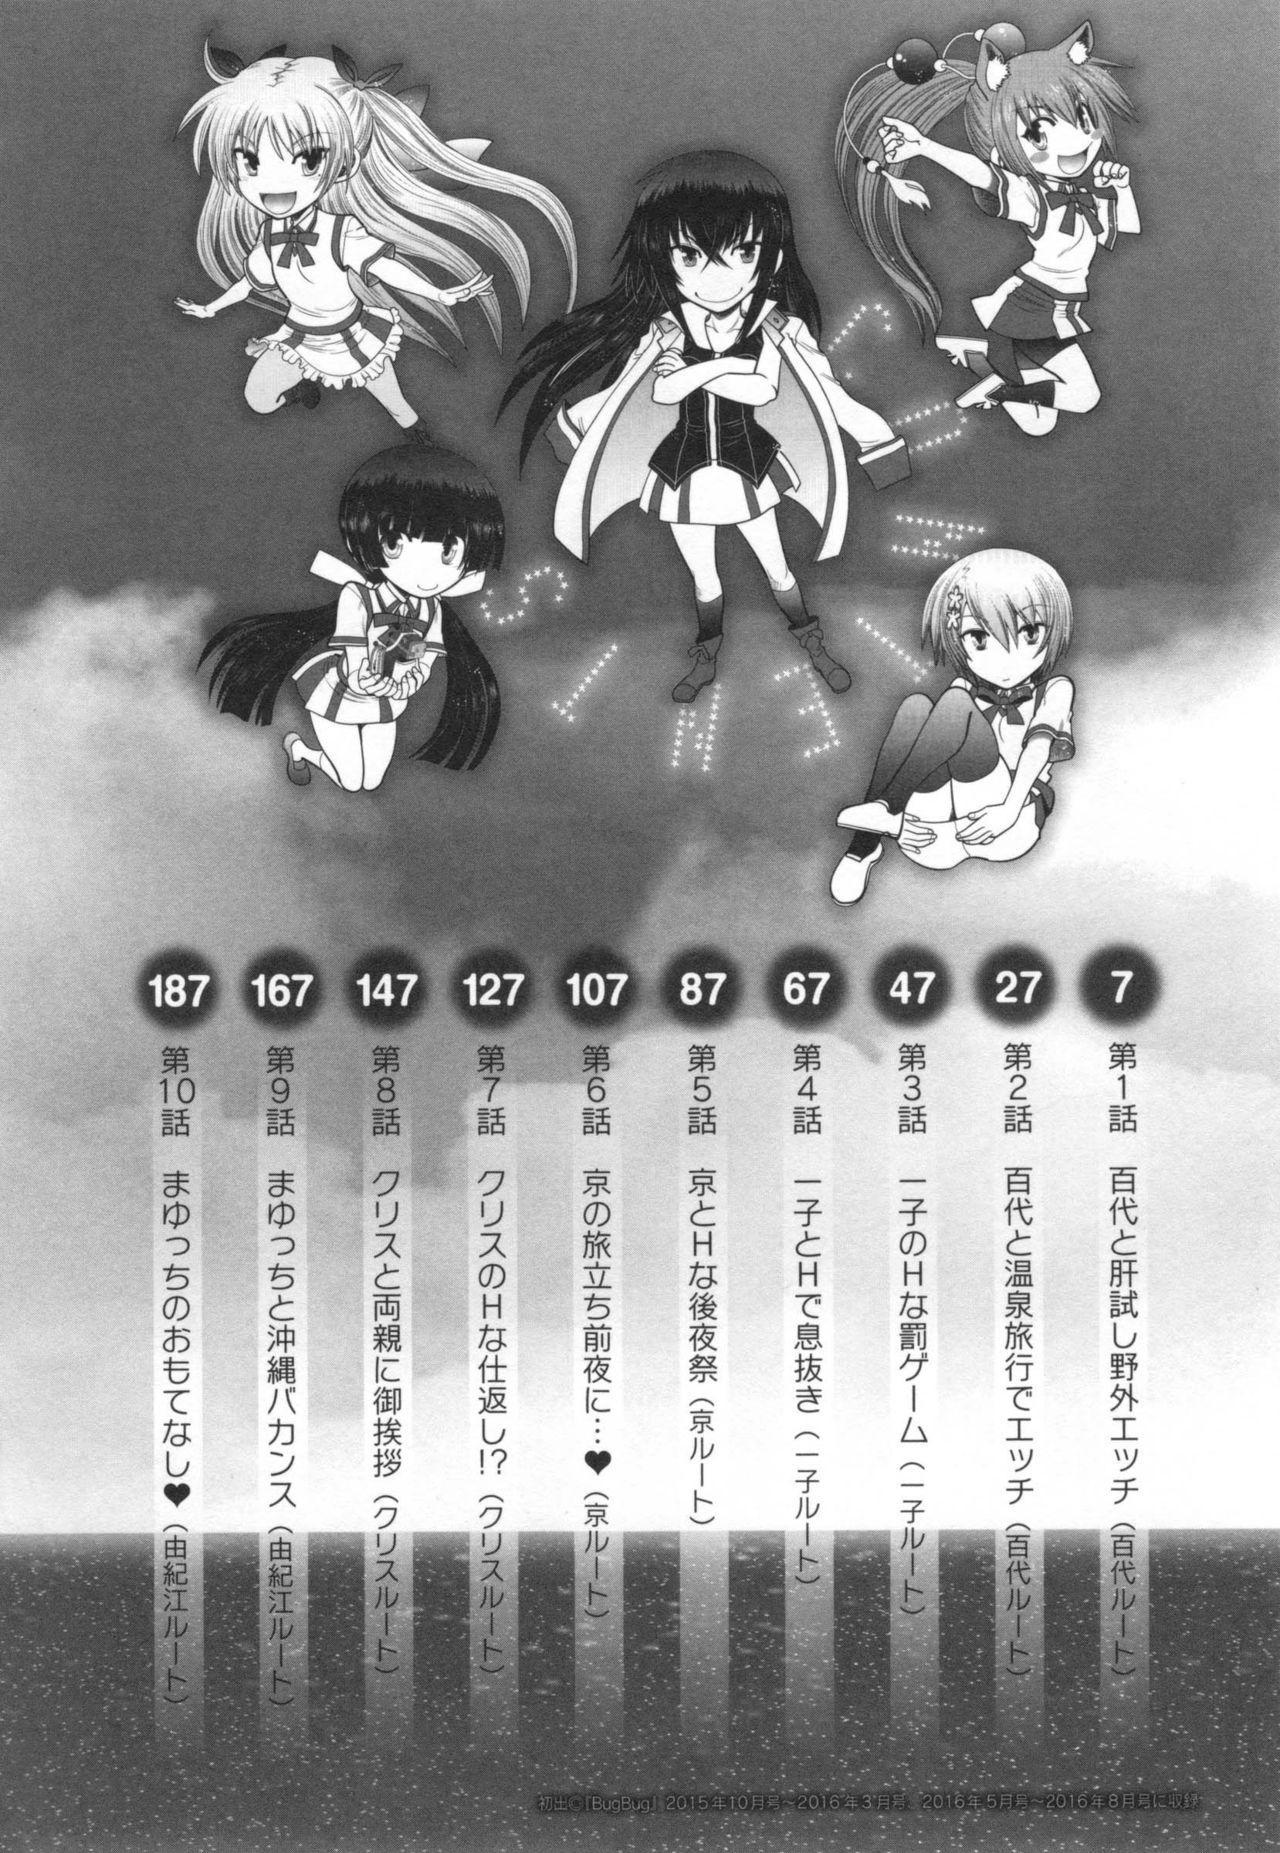 [Yagami Dai] Maji de Watashi ni Koi Shinasai! S Adult Edition ~Shodai Heroine Hen~ | Fall in Love With Me For Real! Ch.1-8 [English] {Doujins.com} 4